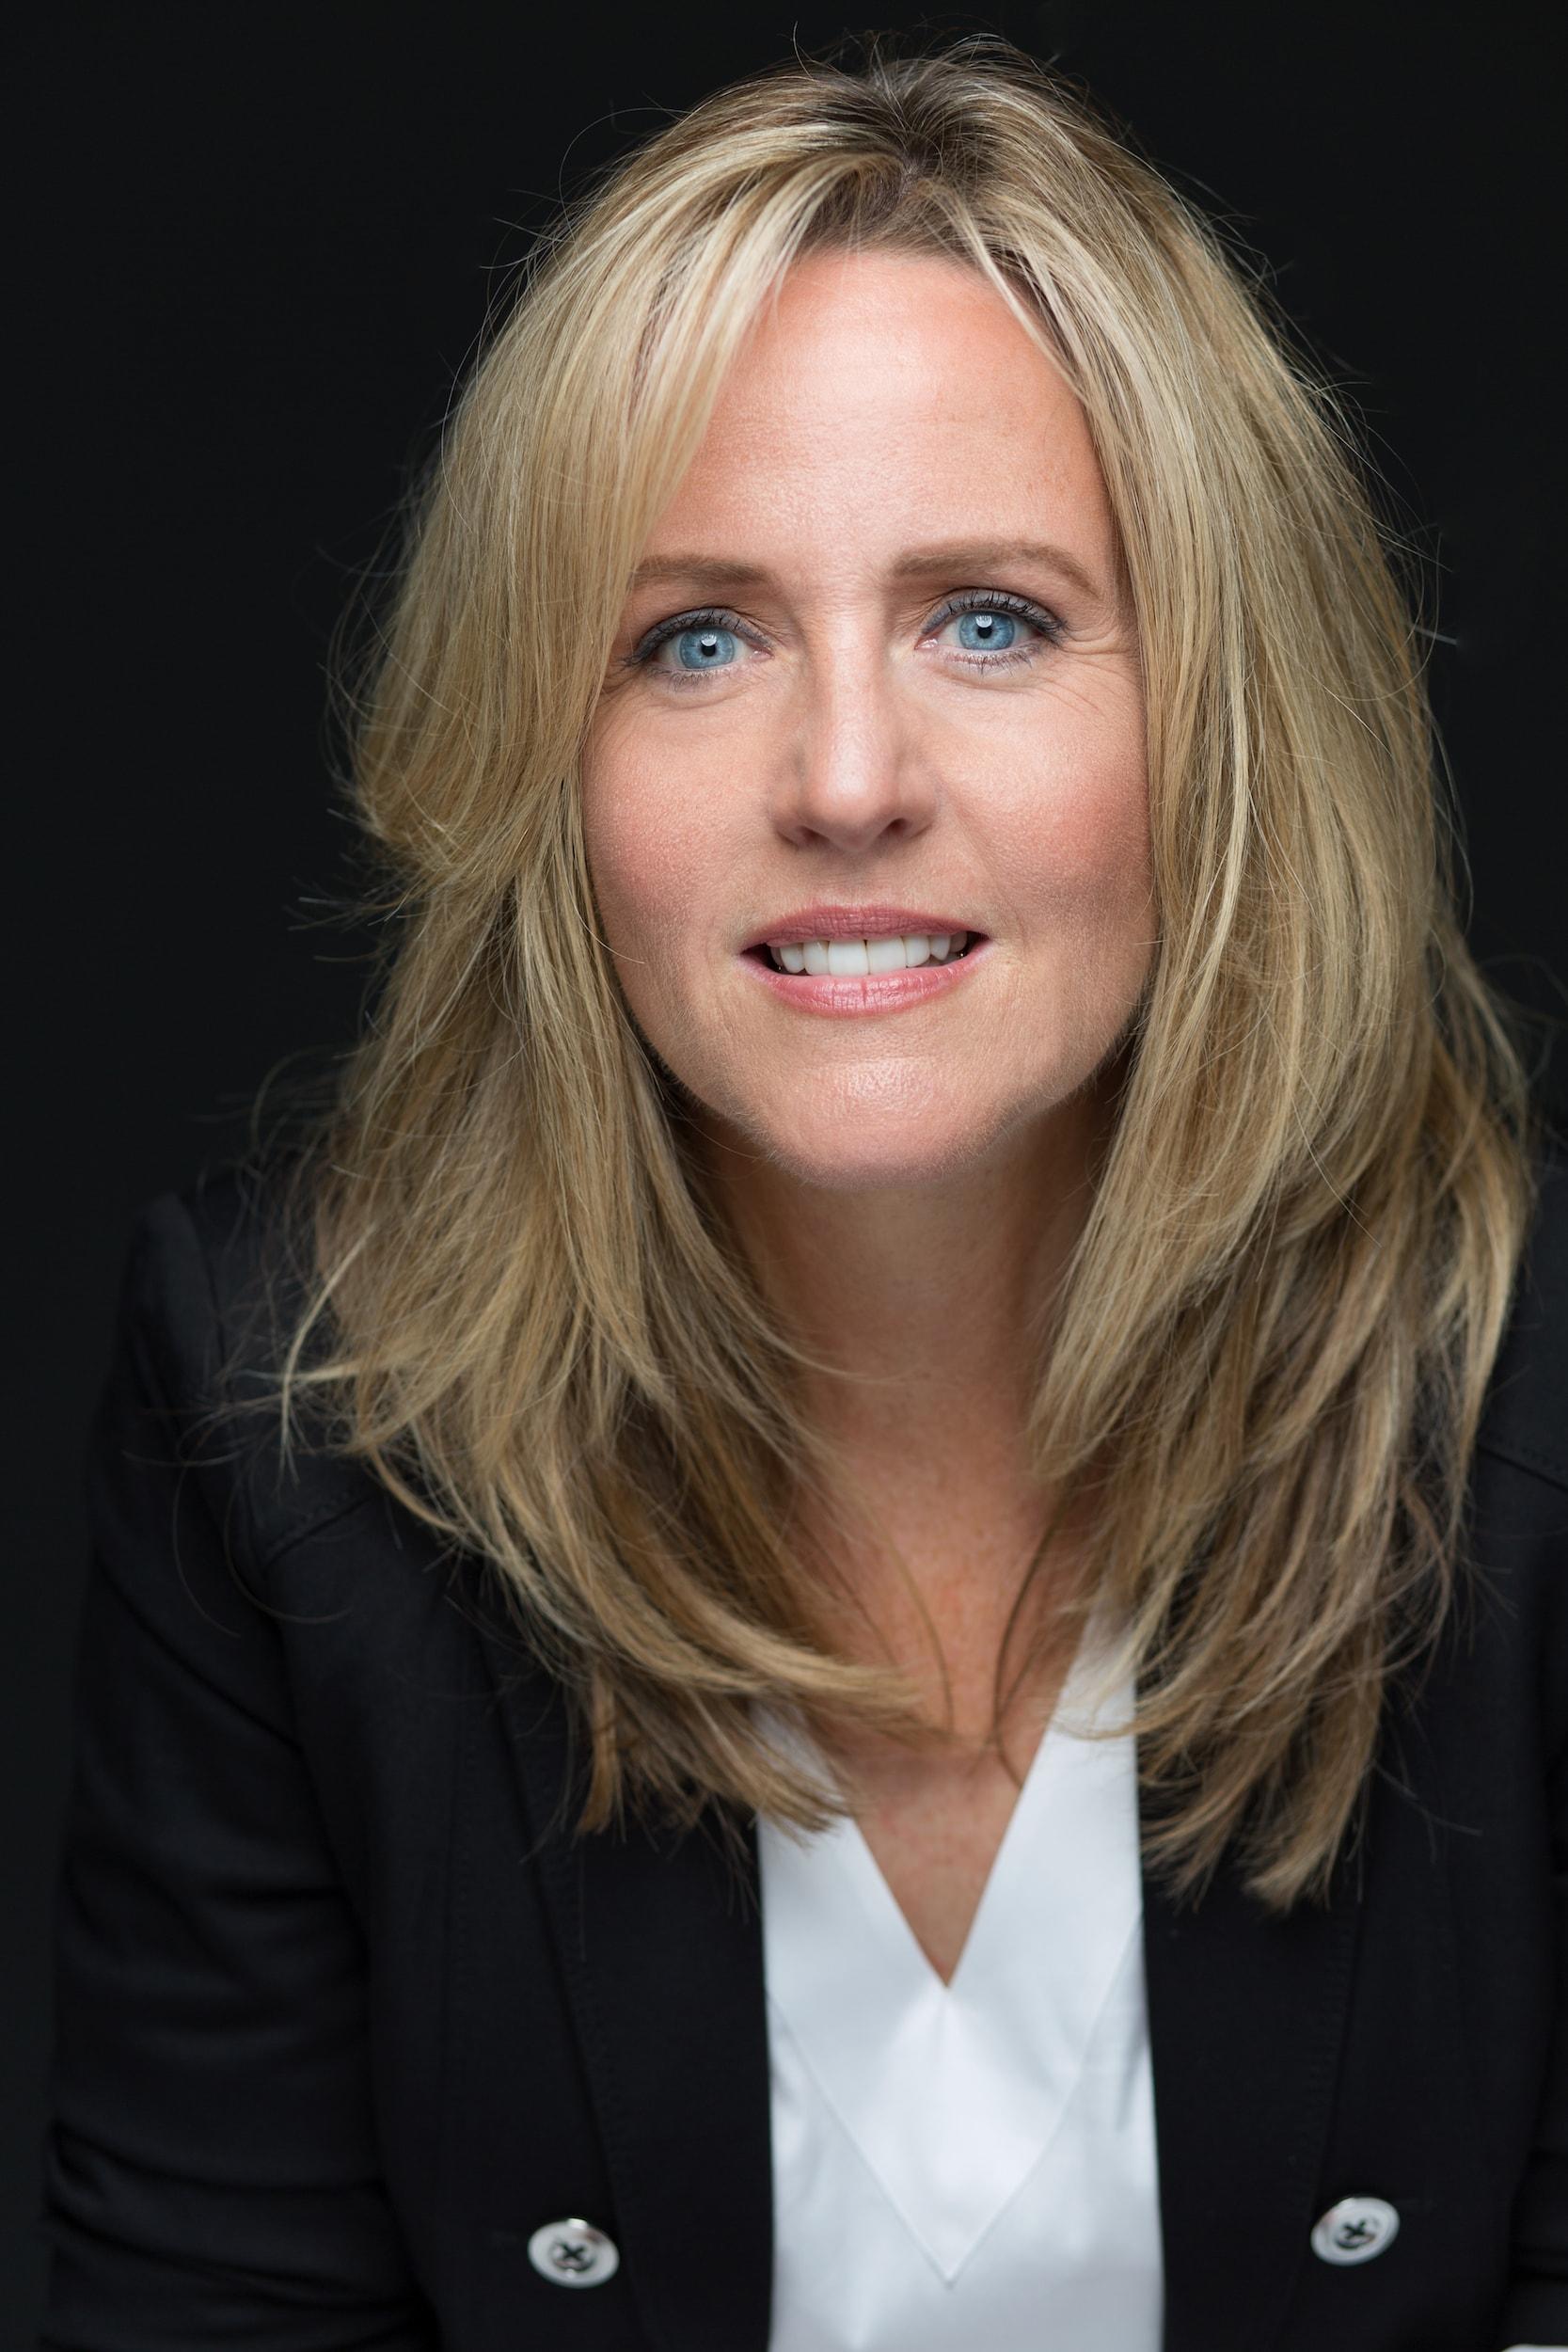 Maureen Doyle - Coach, Author, Speaker